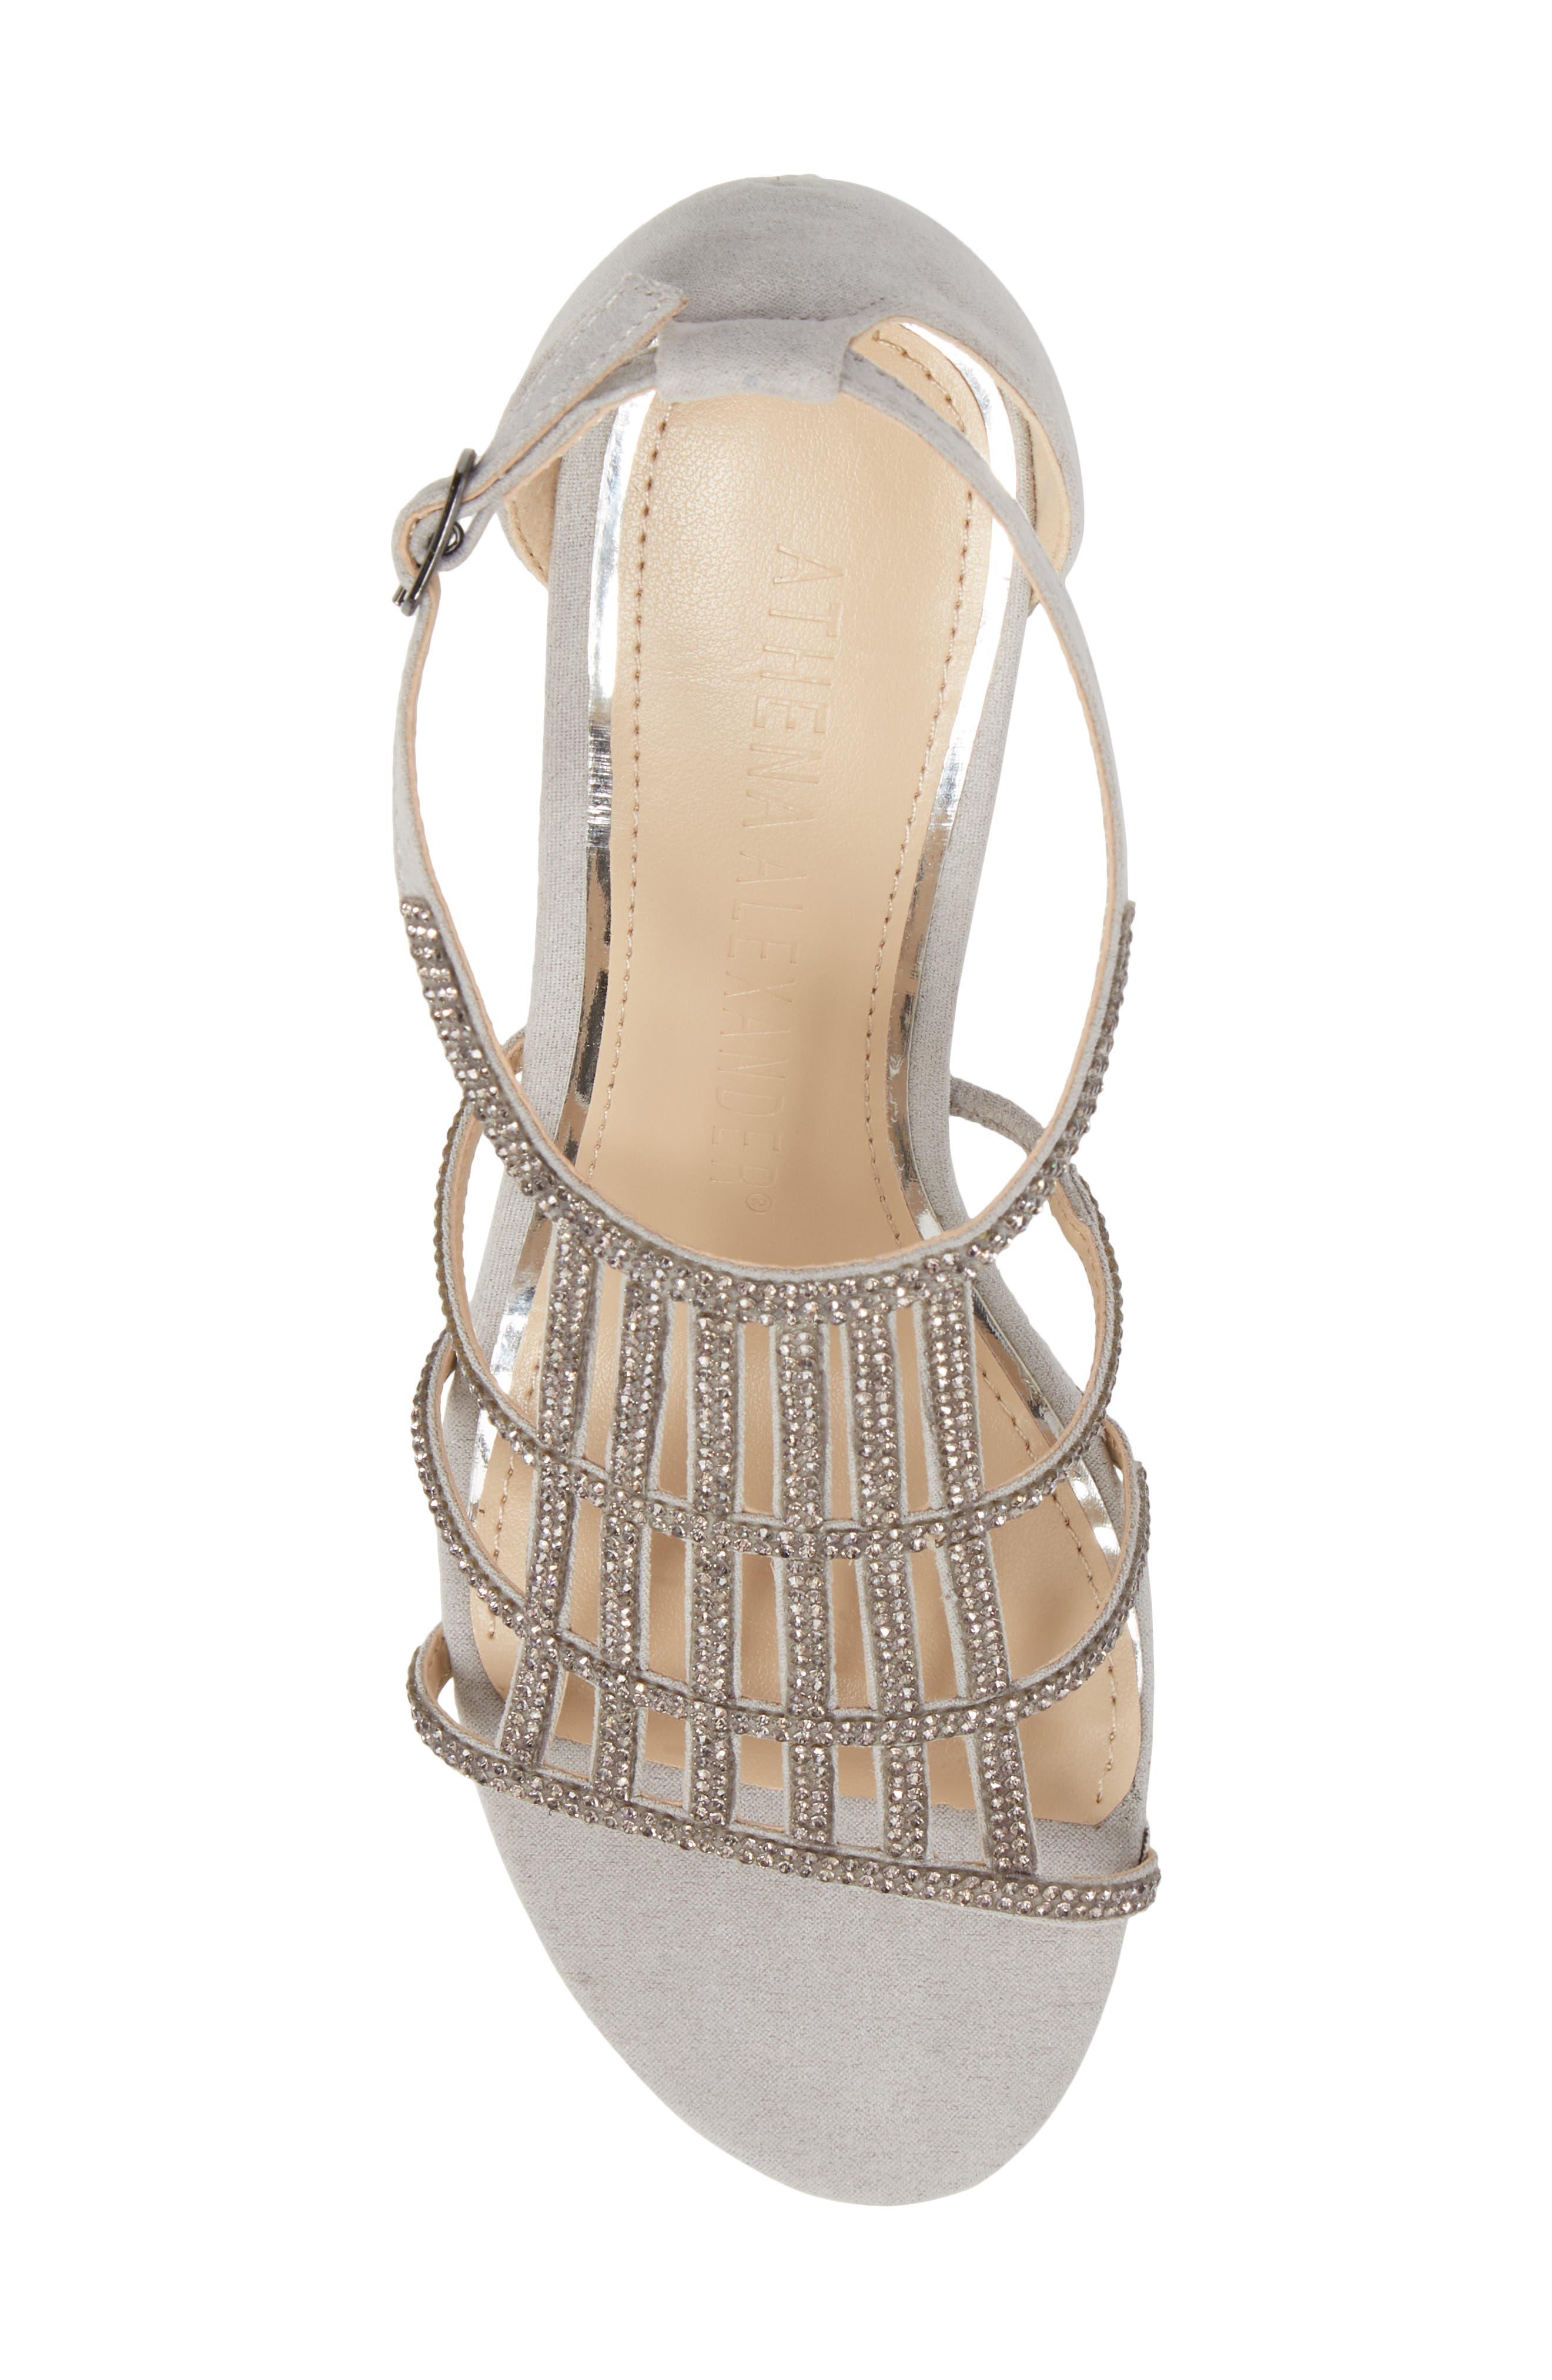 Hampton Crystal Embellished Wedge Sandal,                             Alternate thumbnail 5, color,                             Grey Suede